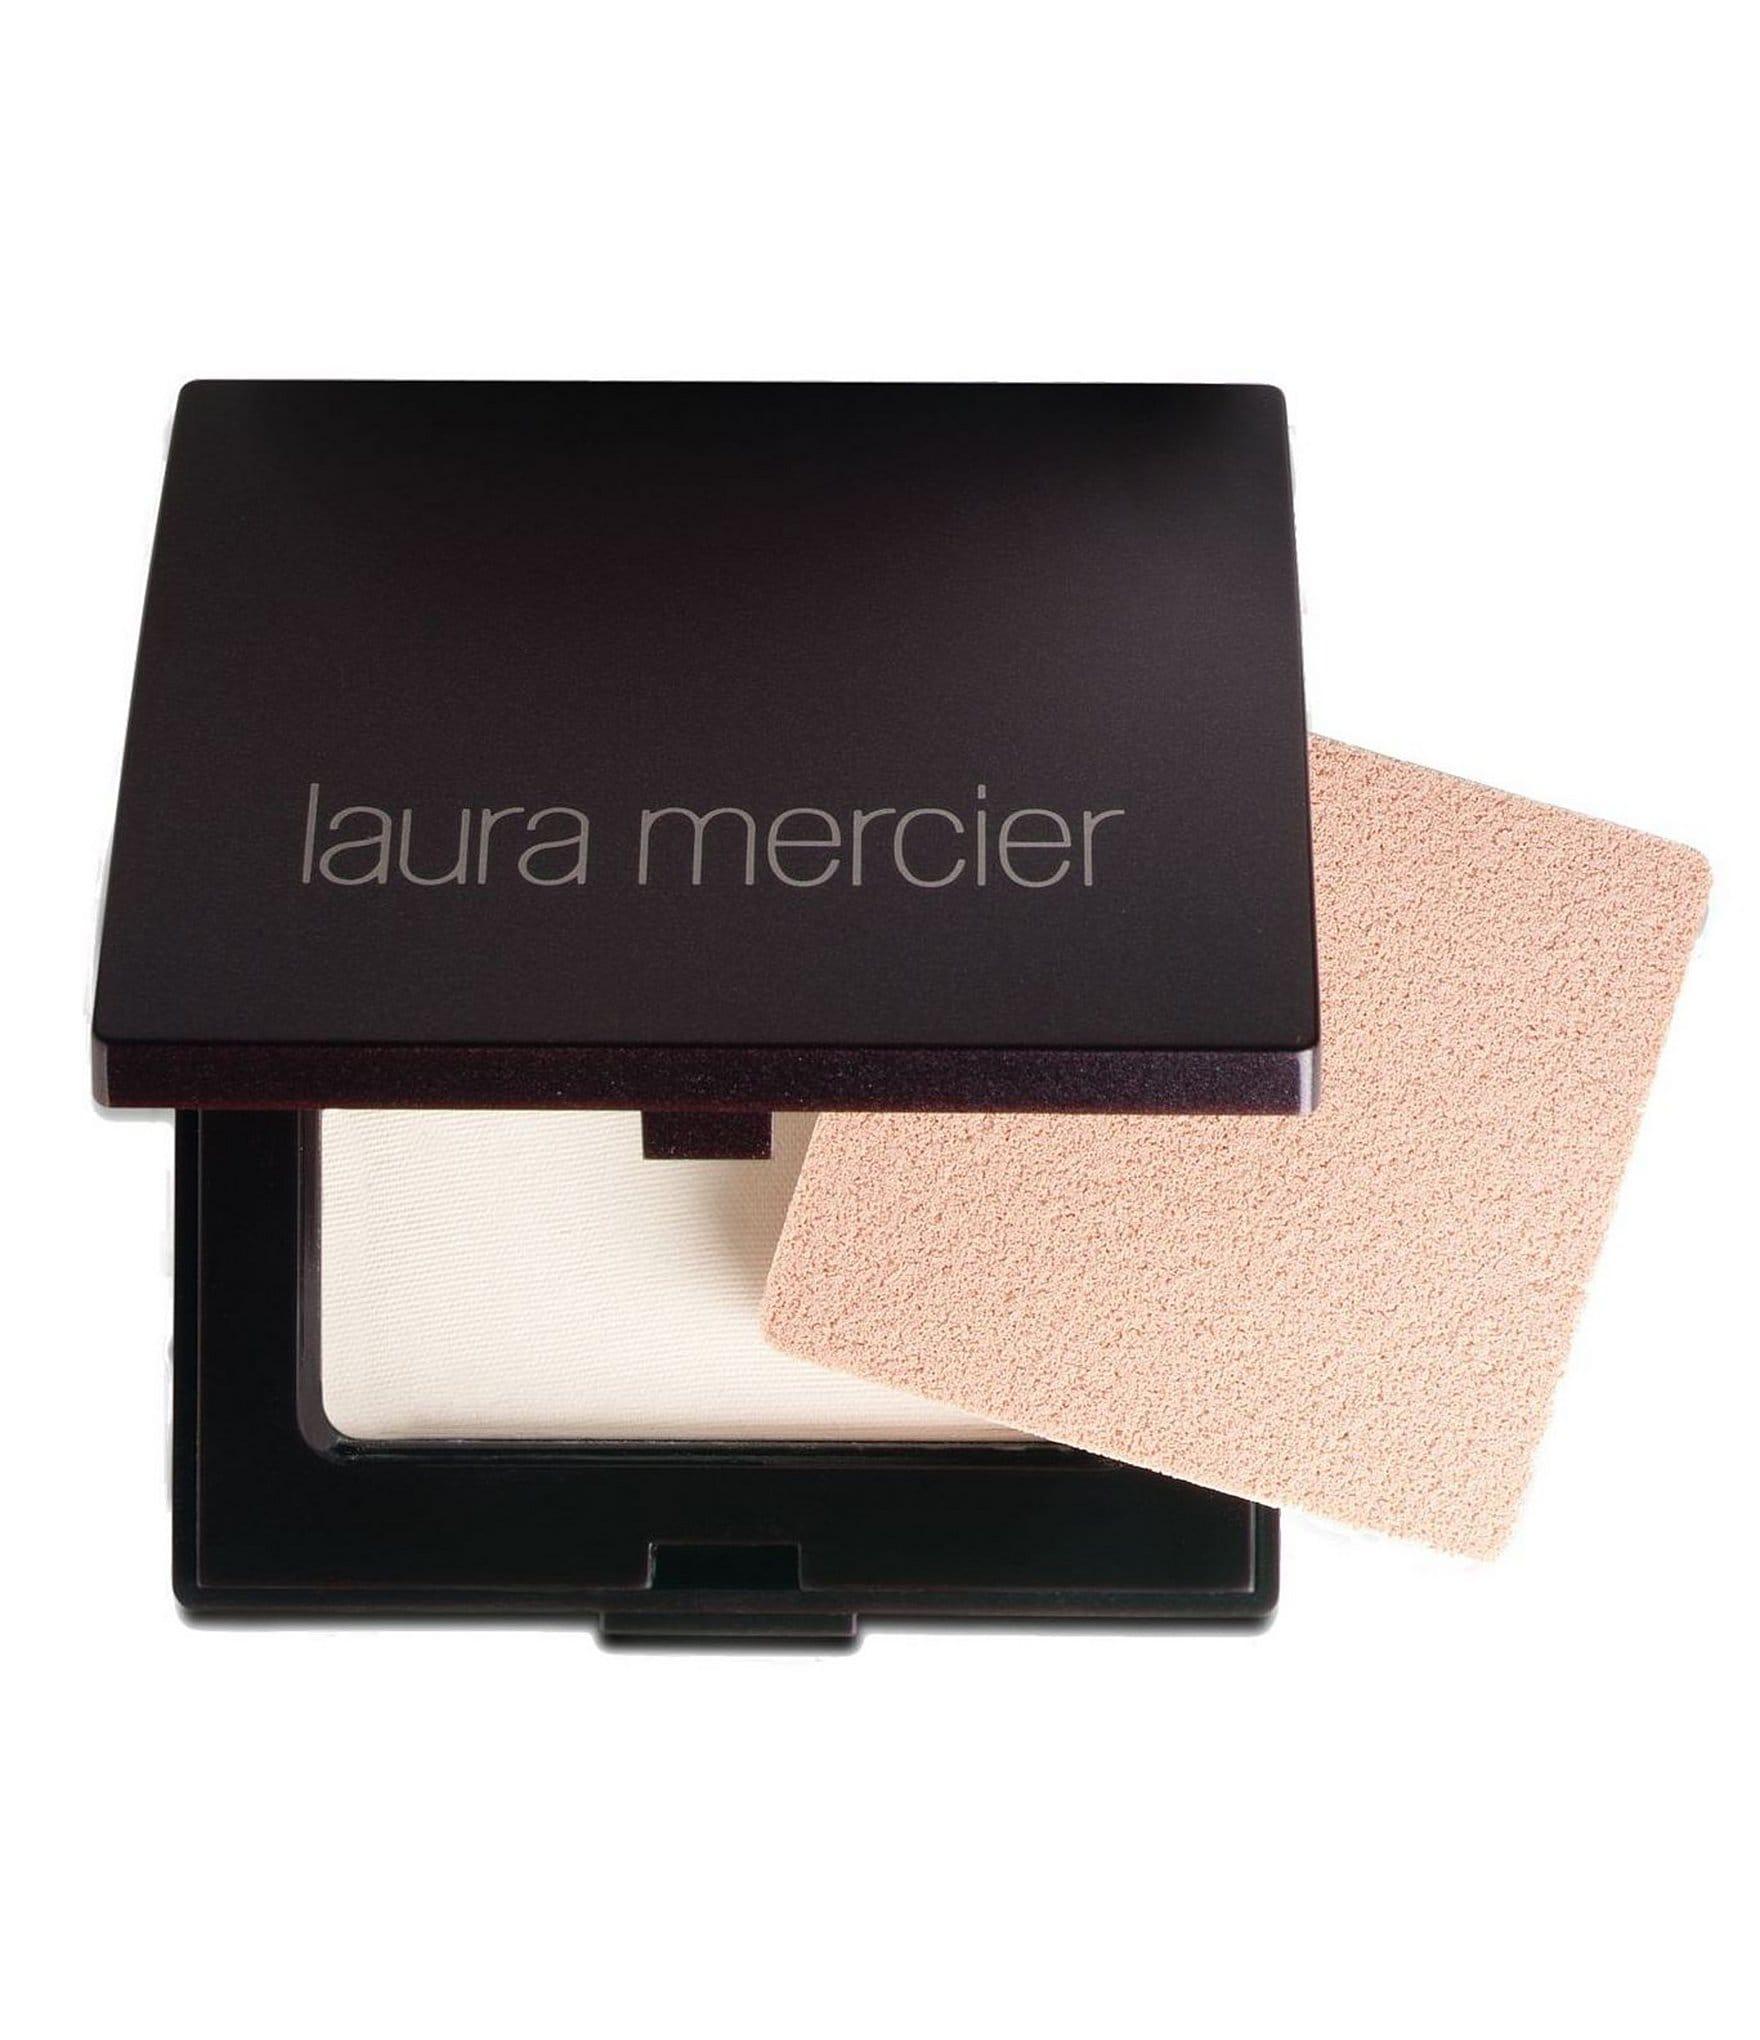 Laura mercier pressed setting powder dillards for Laura mercier on sale